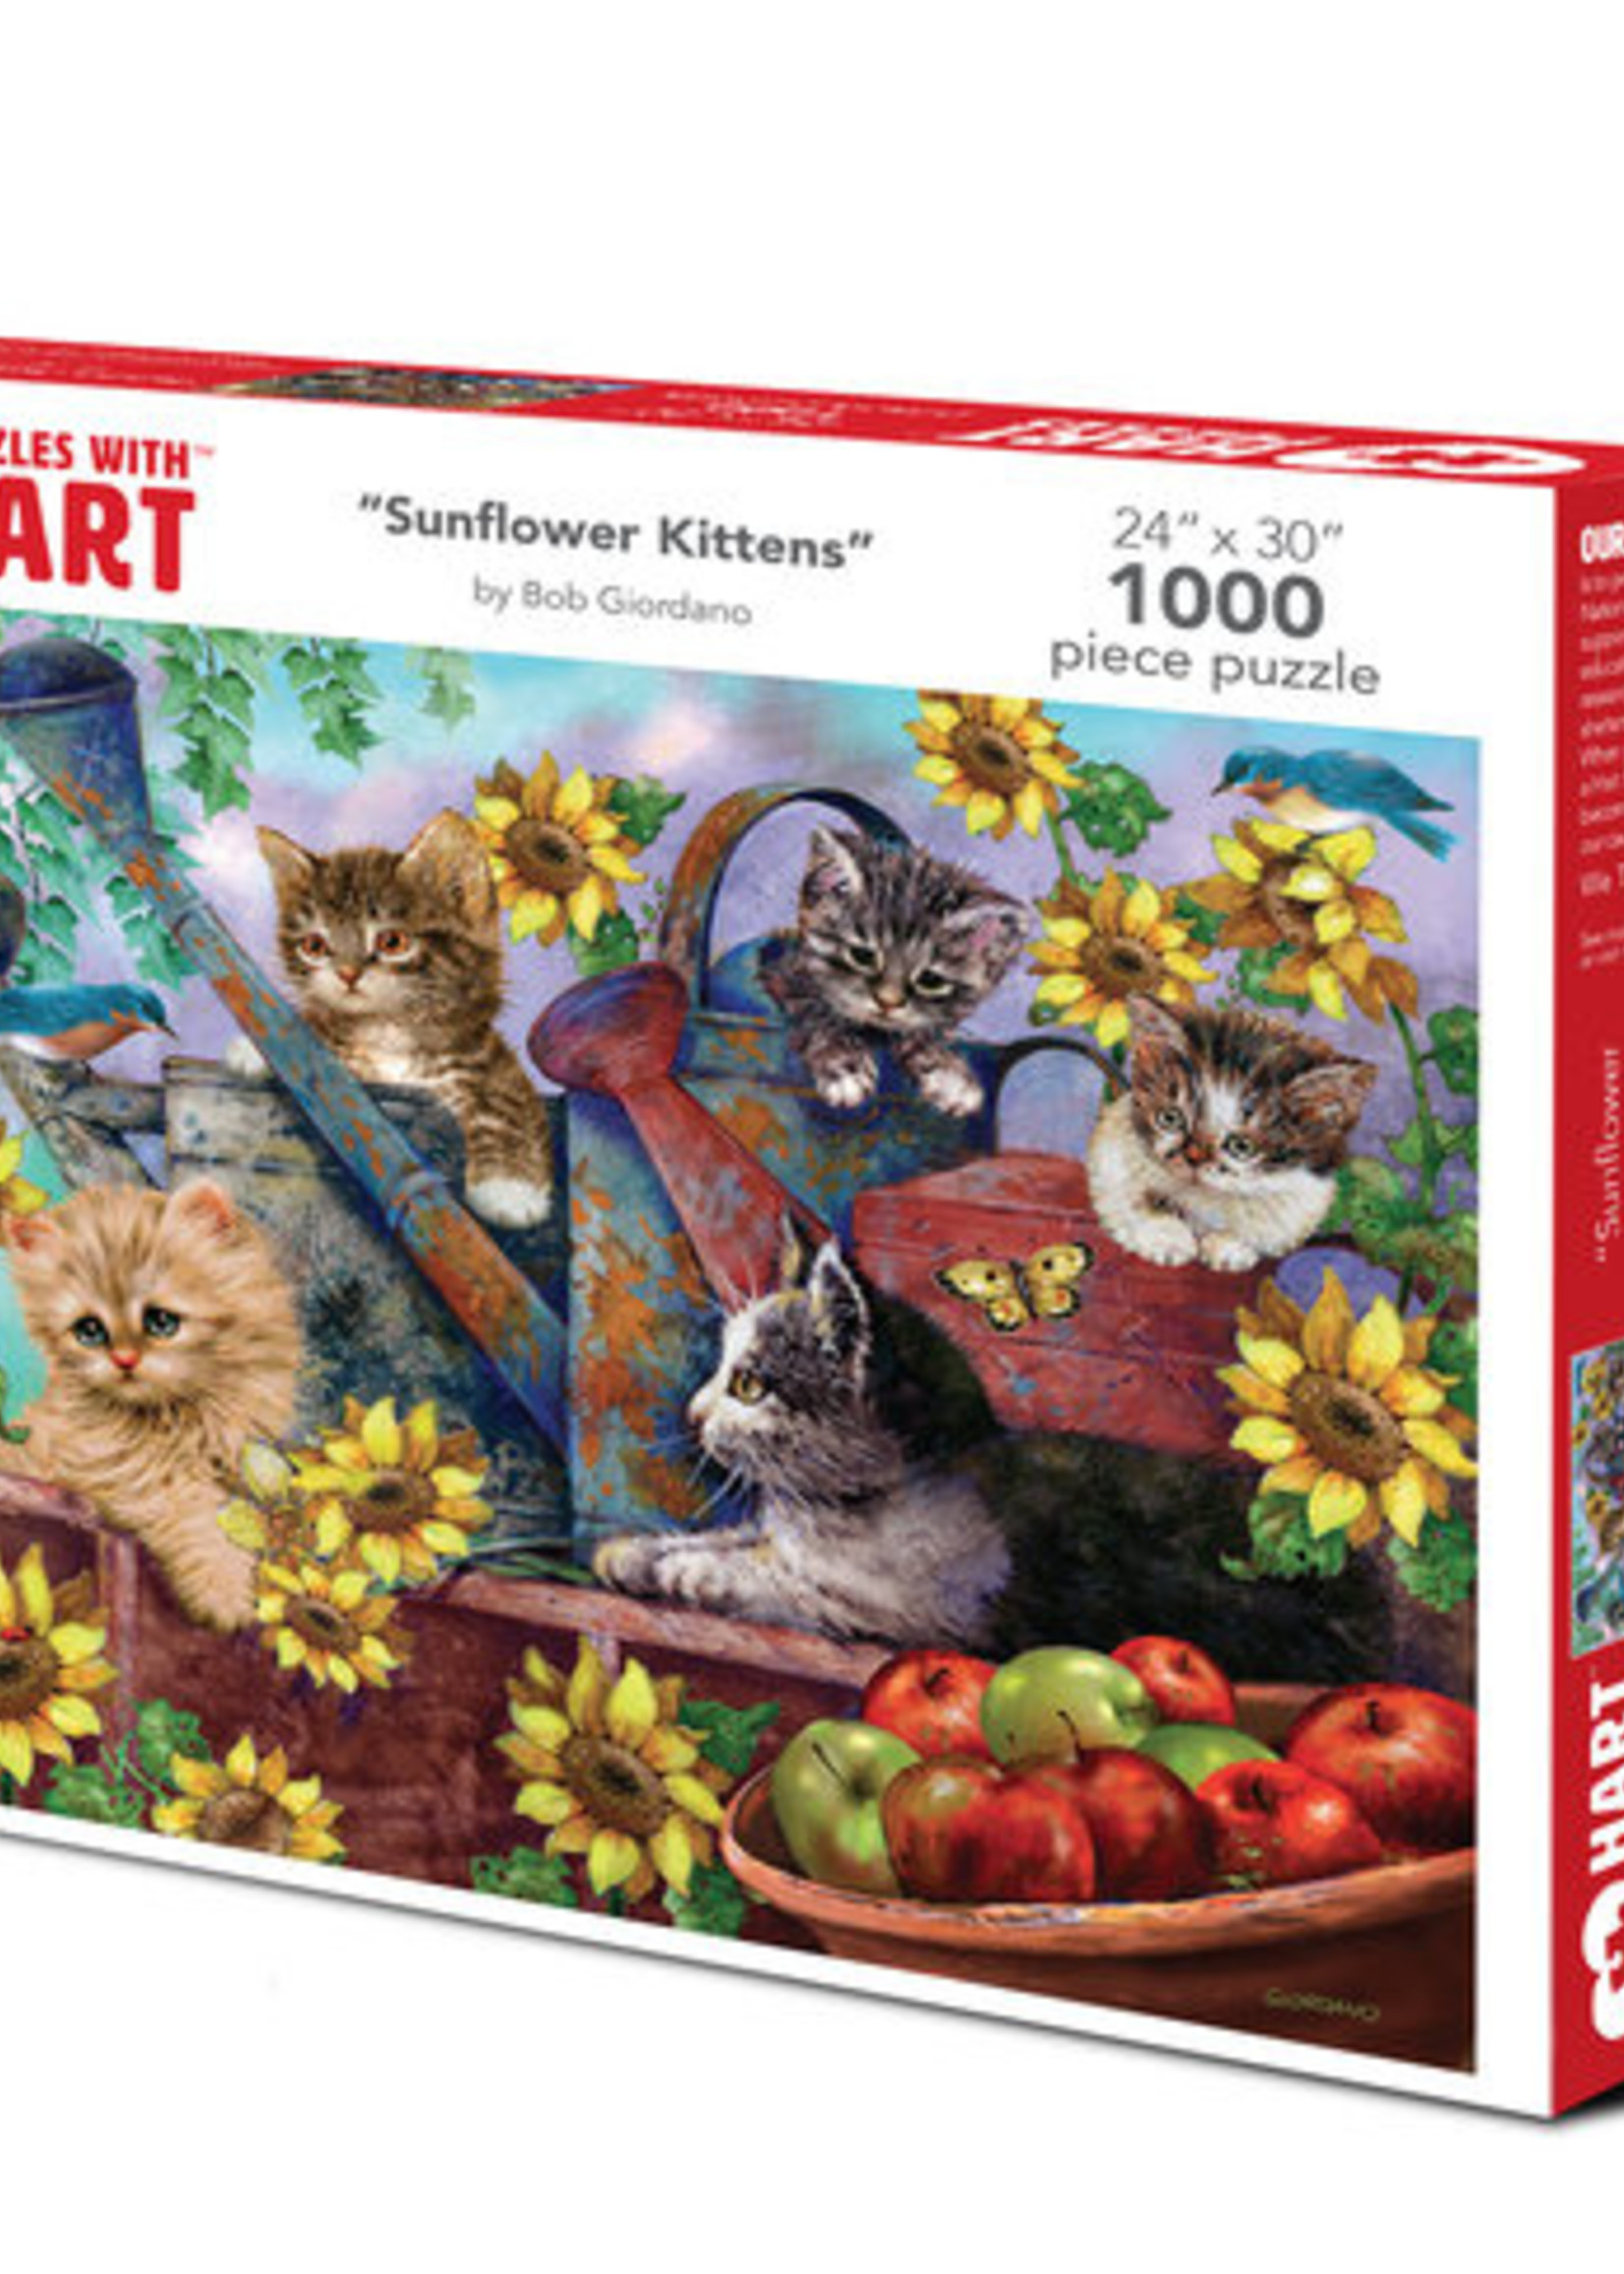 Hart Puzzles Sunflower Kittens